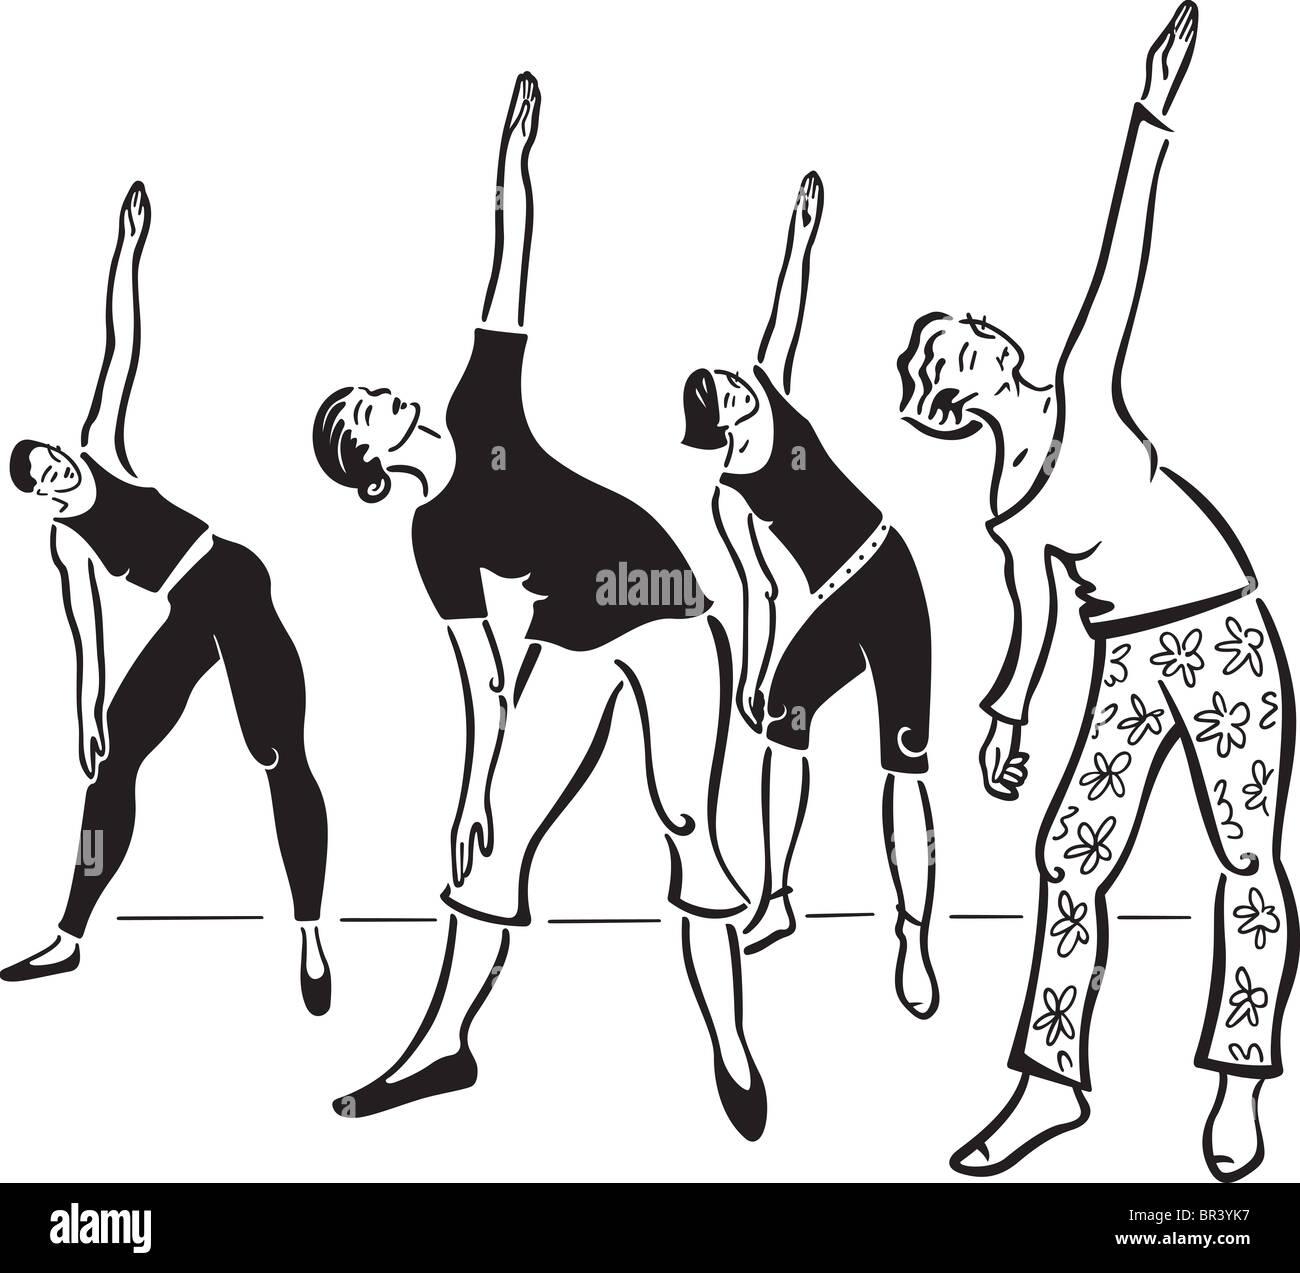 Women stretching - Stock Image